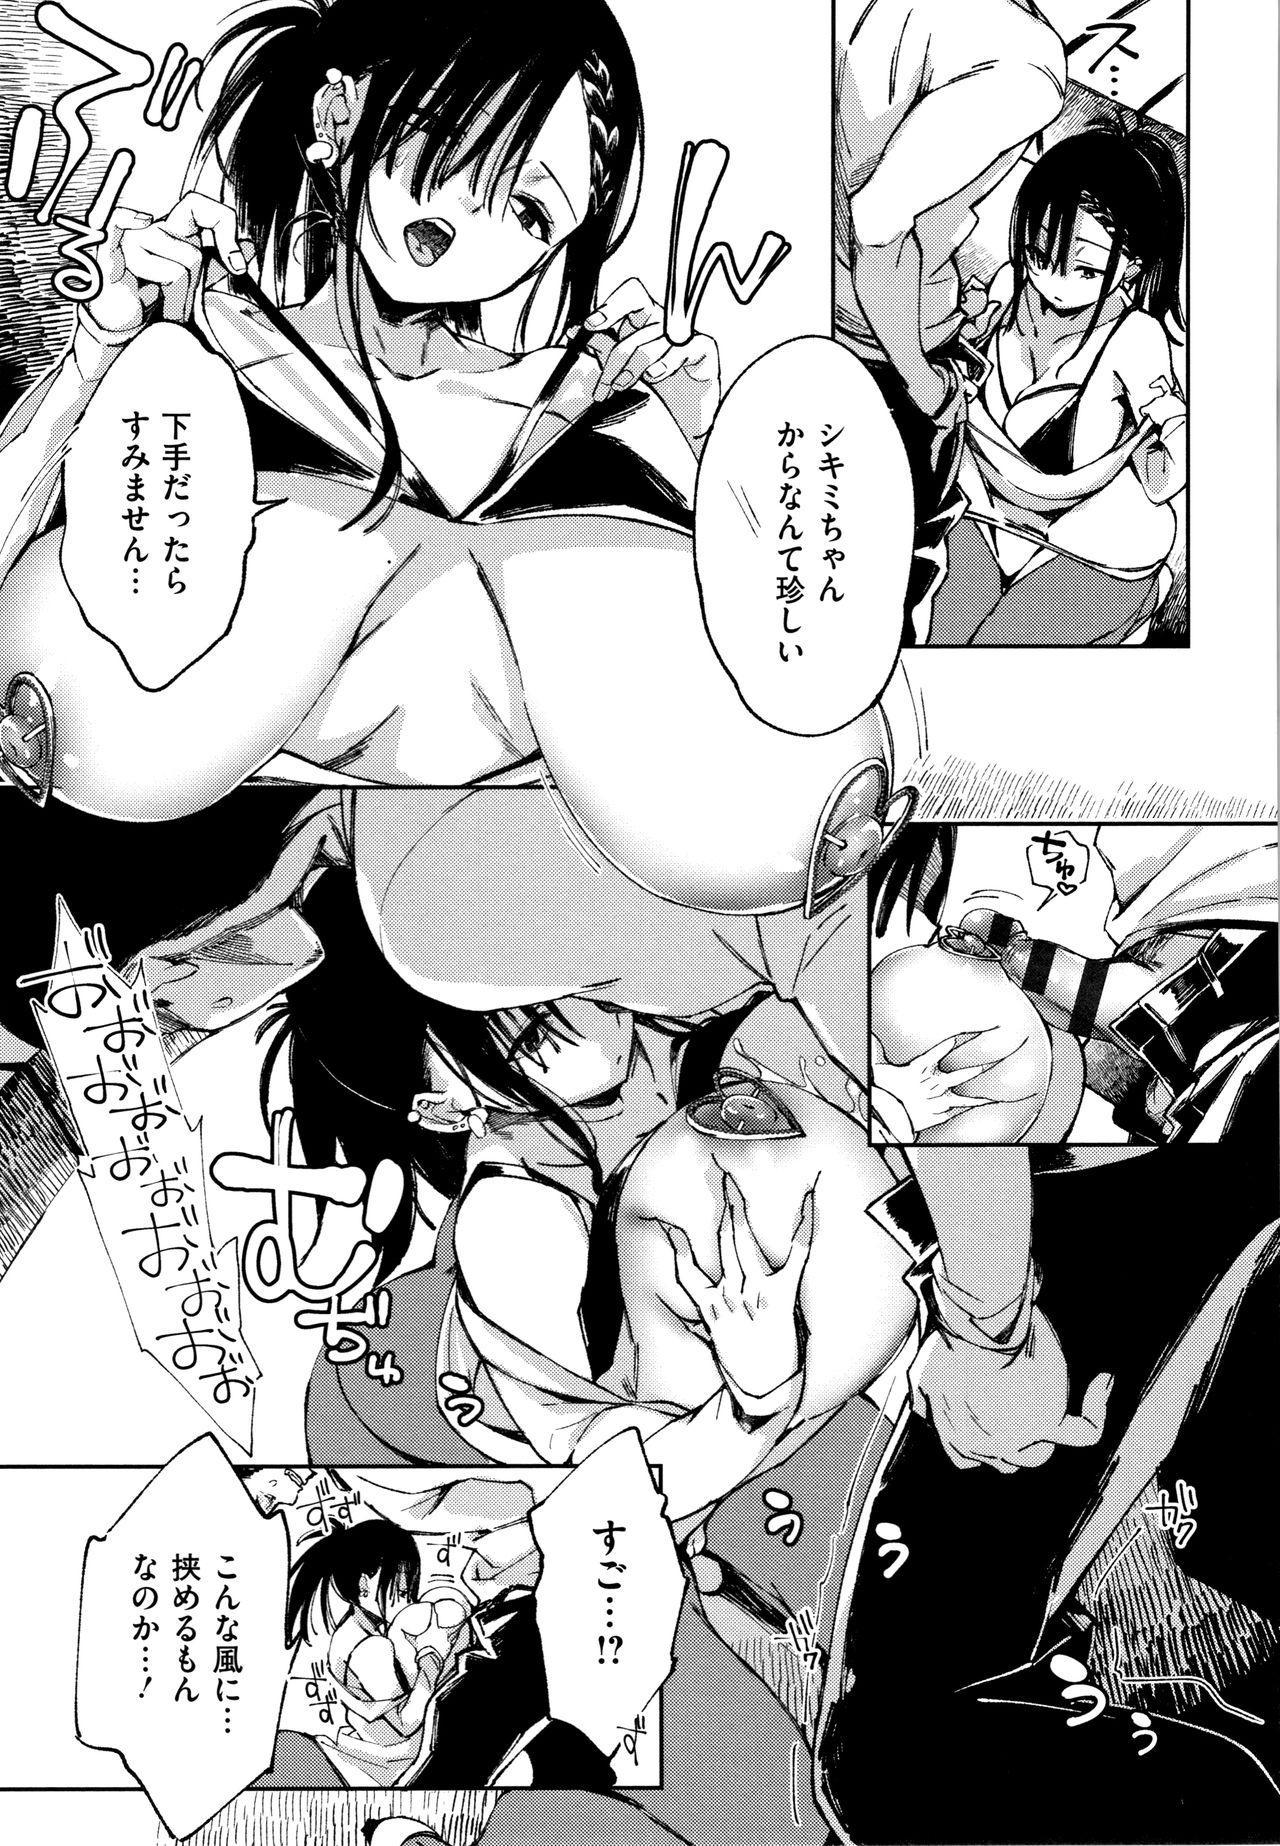 Saijaku Gal wa Ikizurai! - The weakest pussy is hard to go. 179